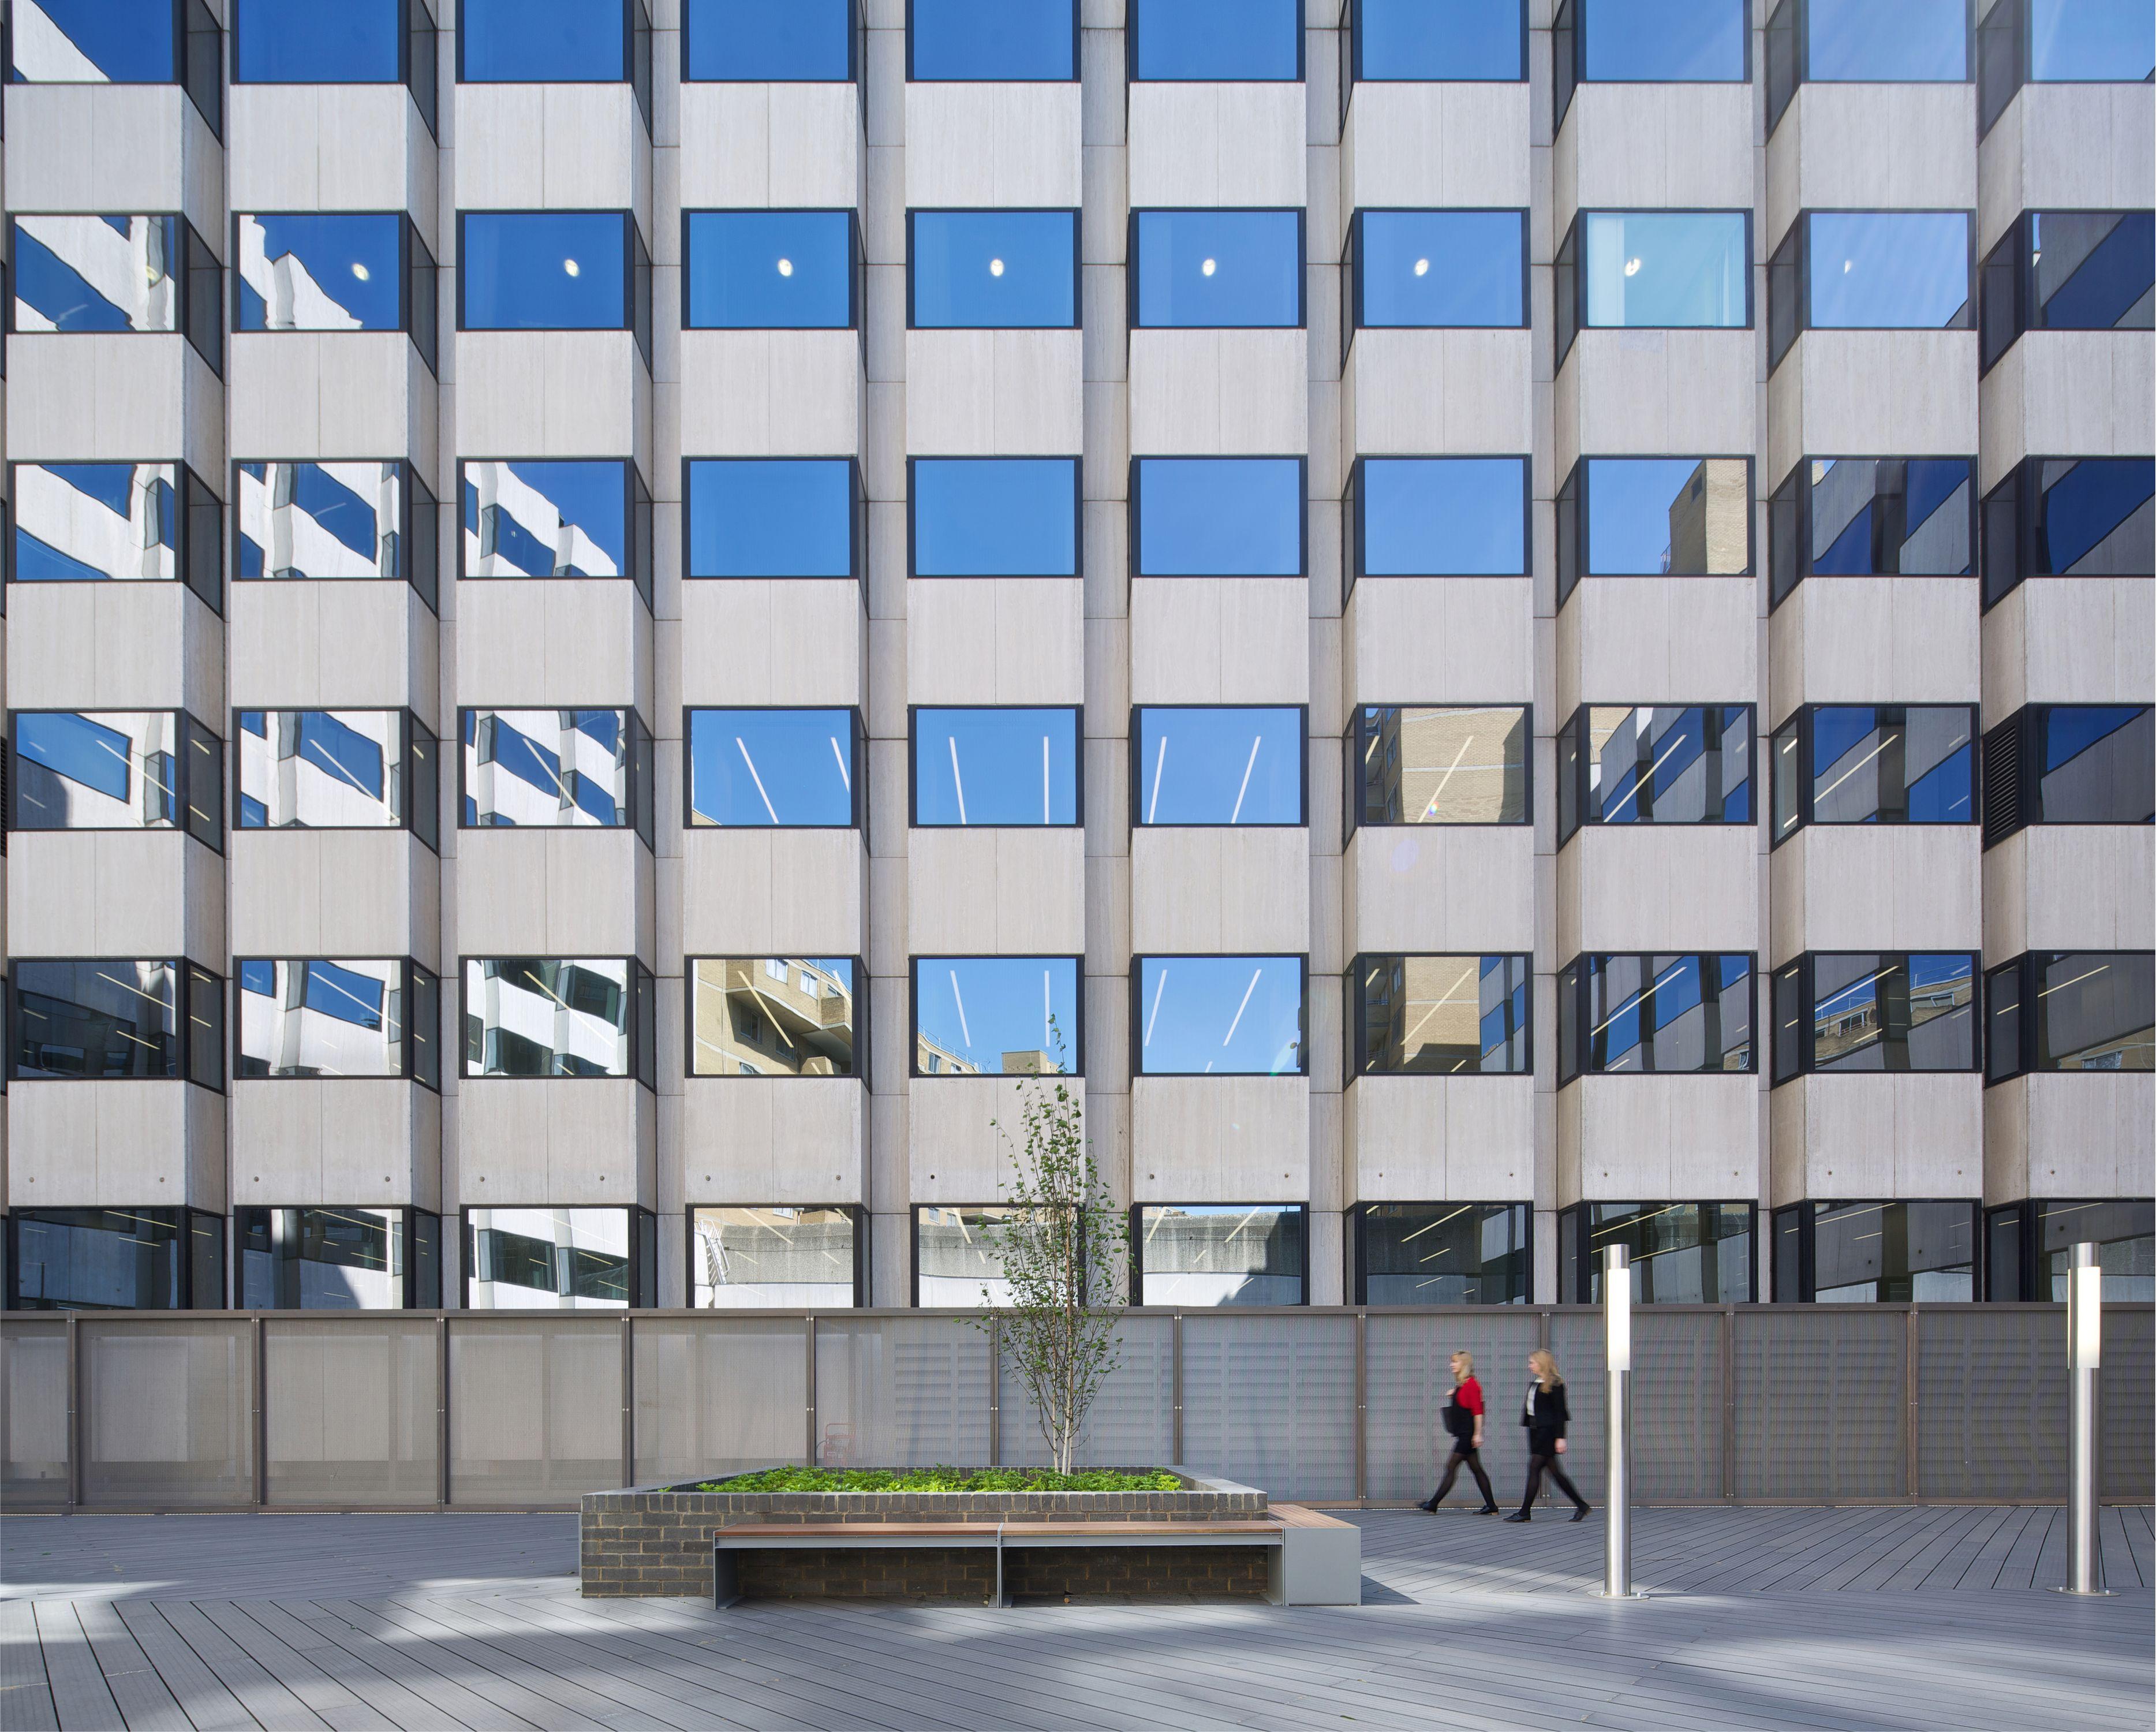 120 Holborn Office Exterior